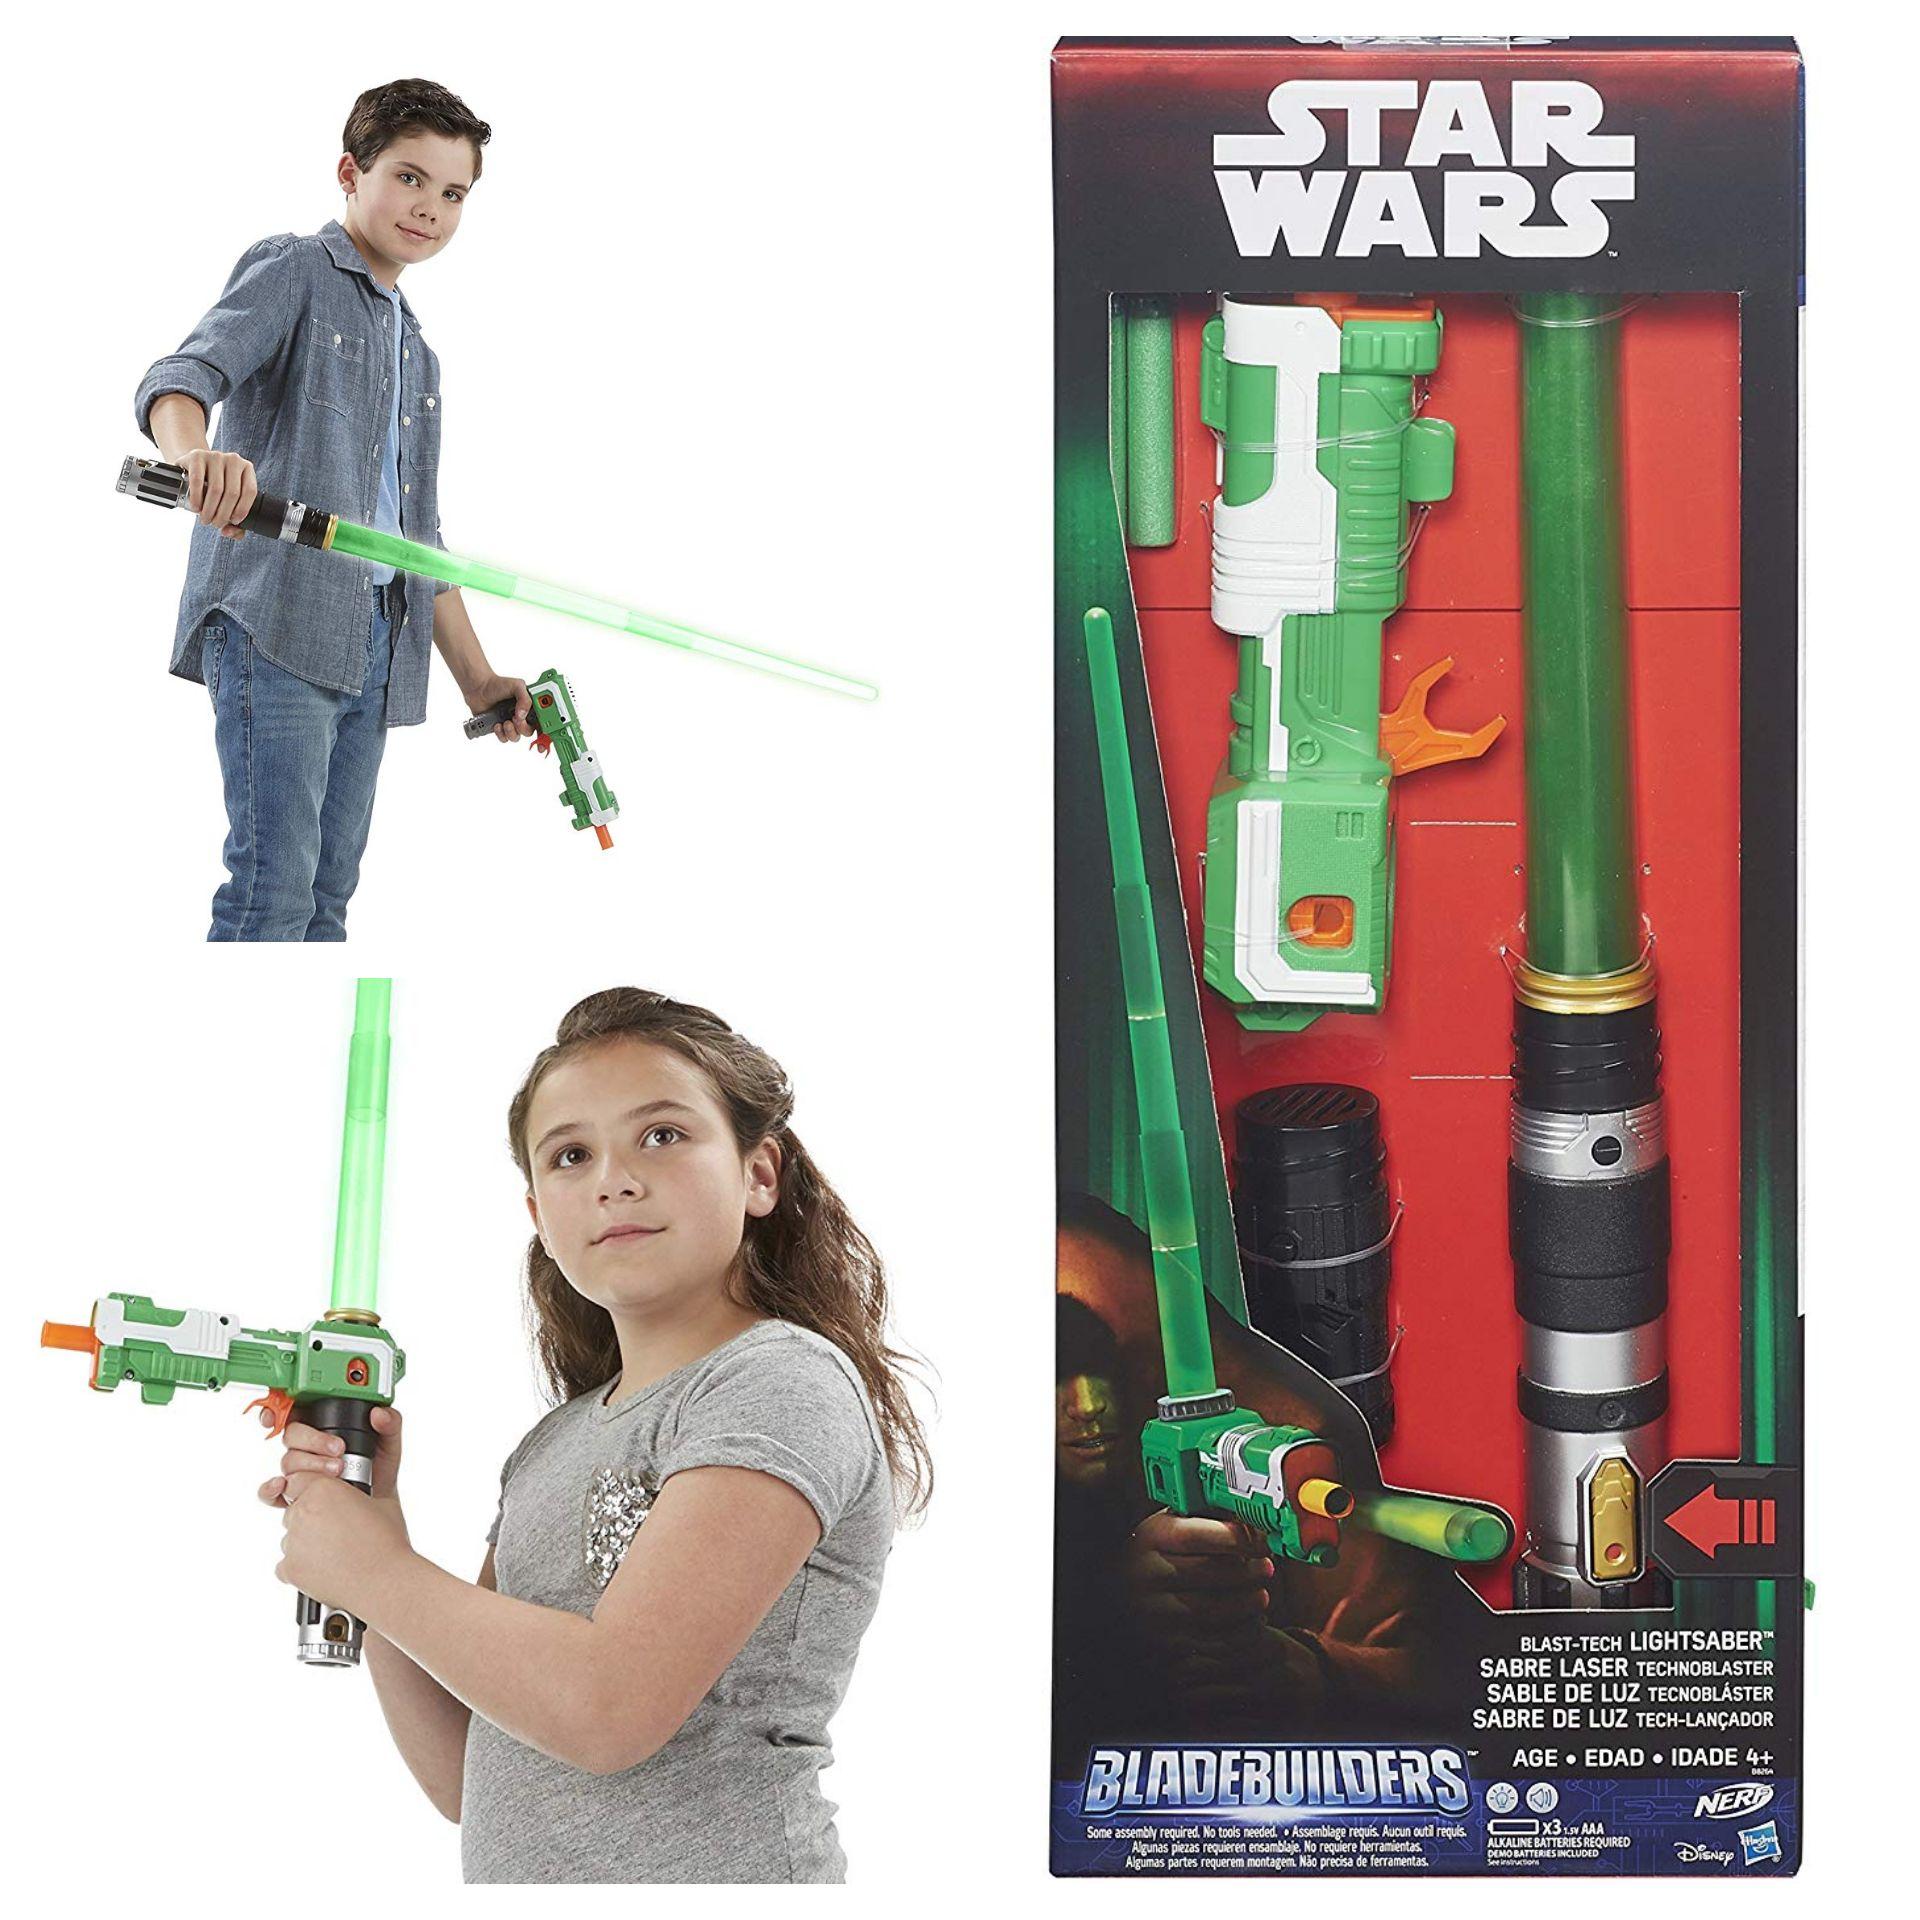 Star Wars Blade Builders Blast Tech Lightsaber (Green) toy with detachable Nerf gun (Amazon add-on)